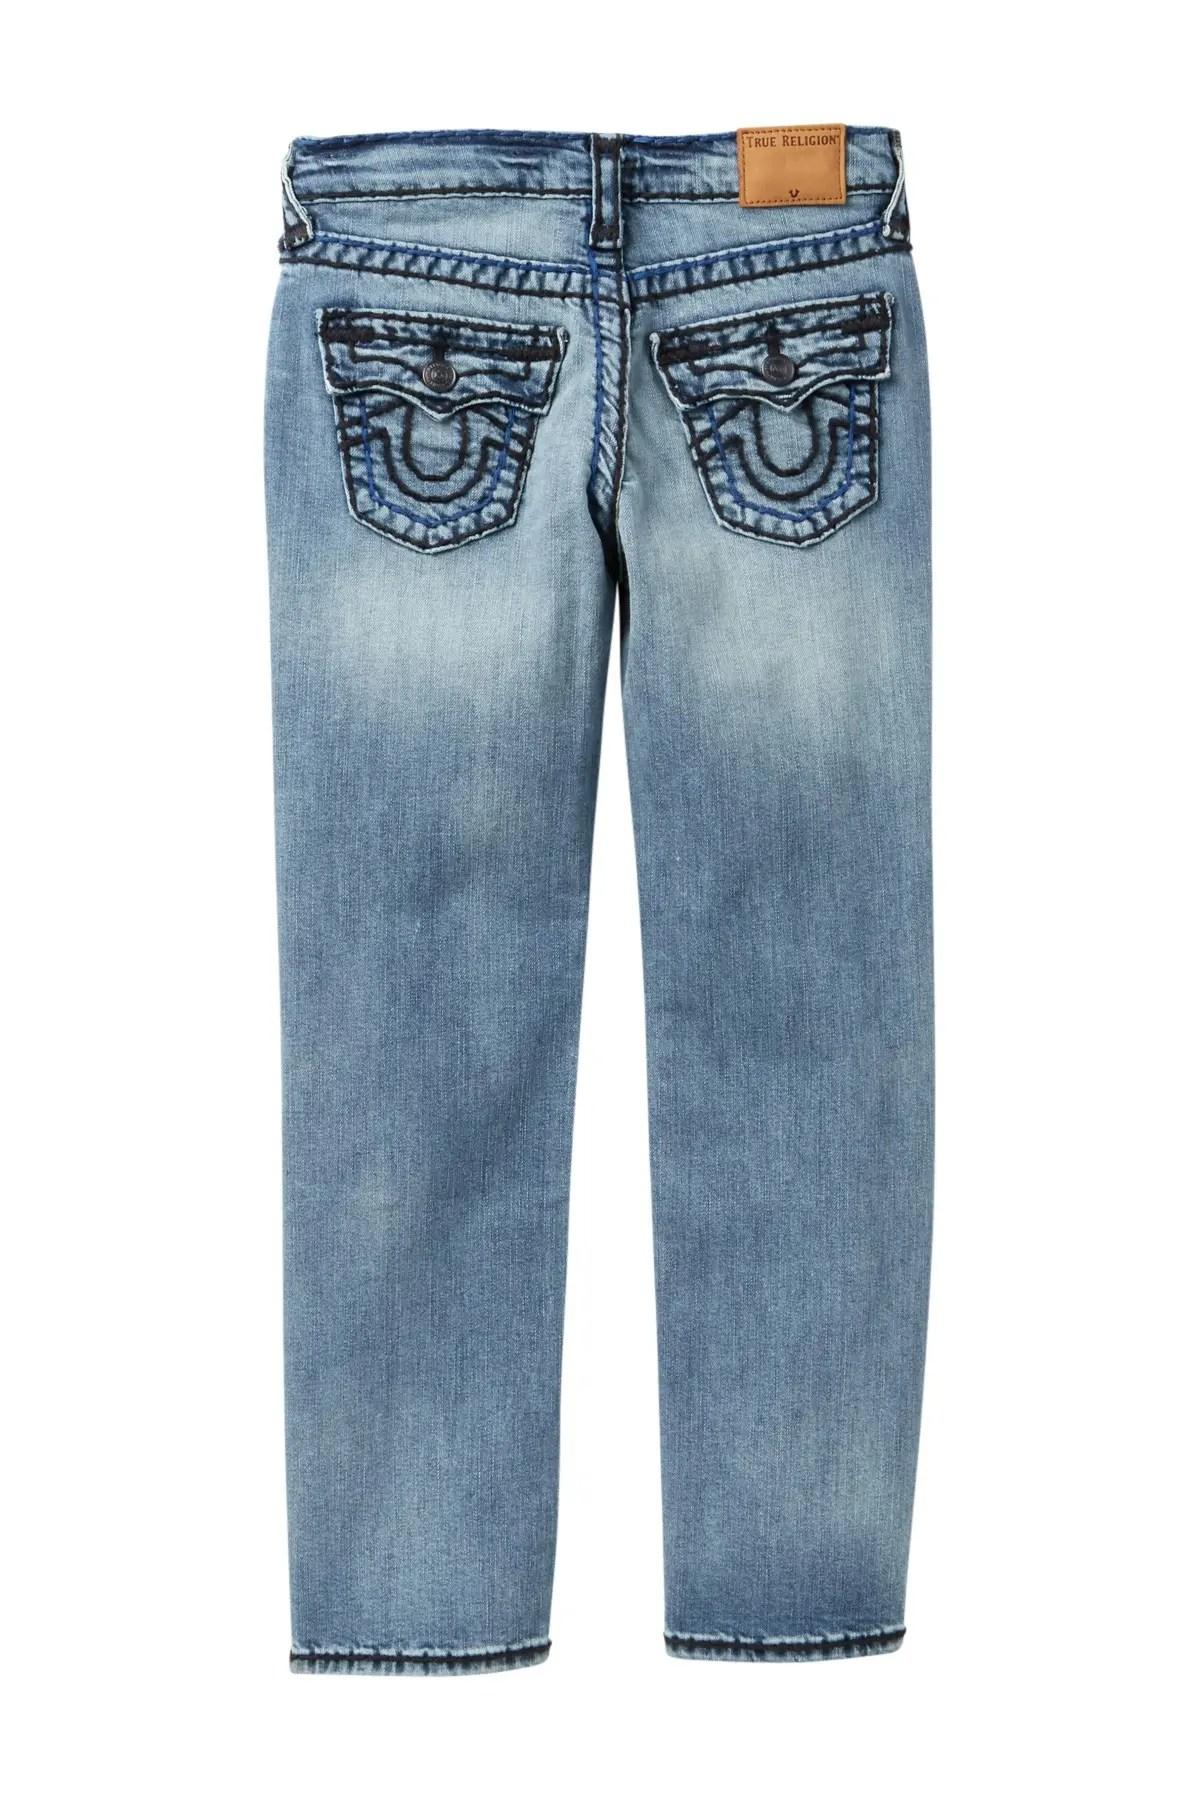 true religion geno super t slim jeans toddler little kids nordstrom rack